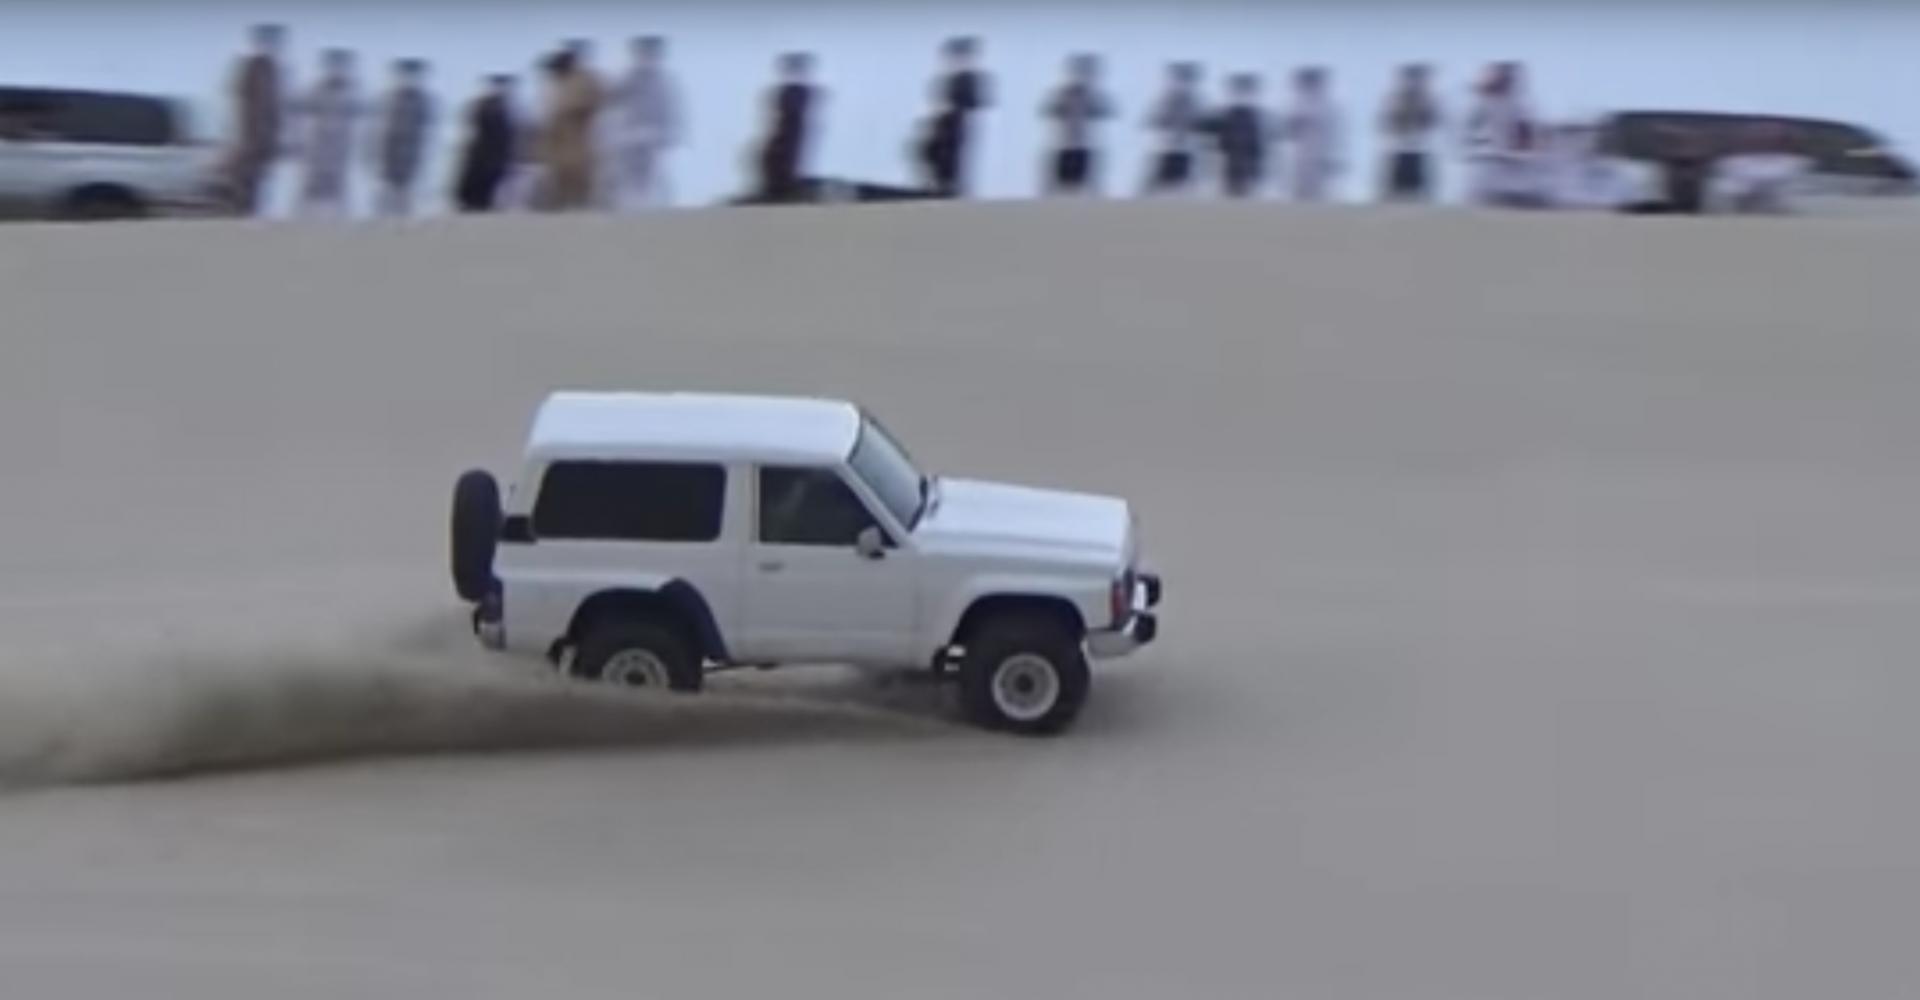 Dune Bashing Looks Like A Whole Heap Of Fun